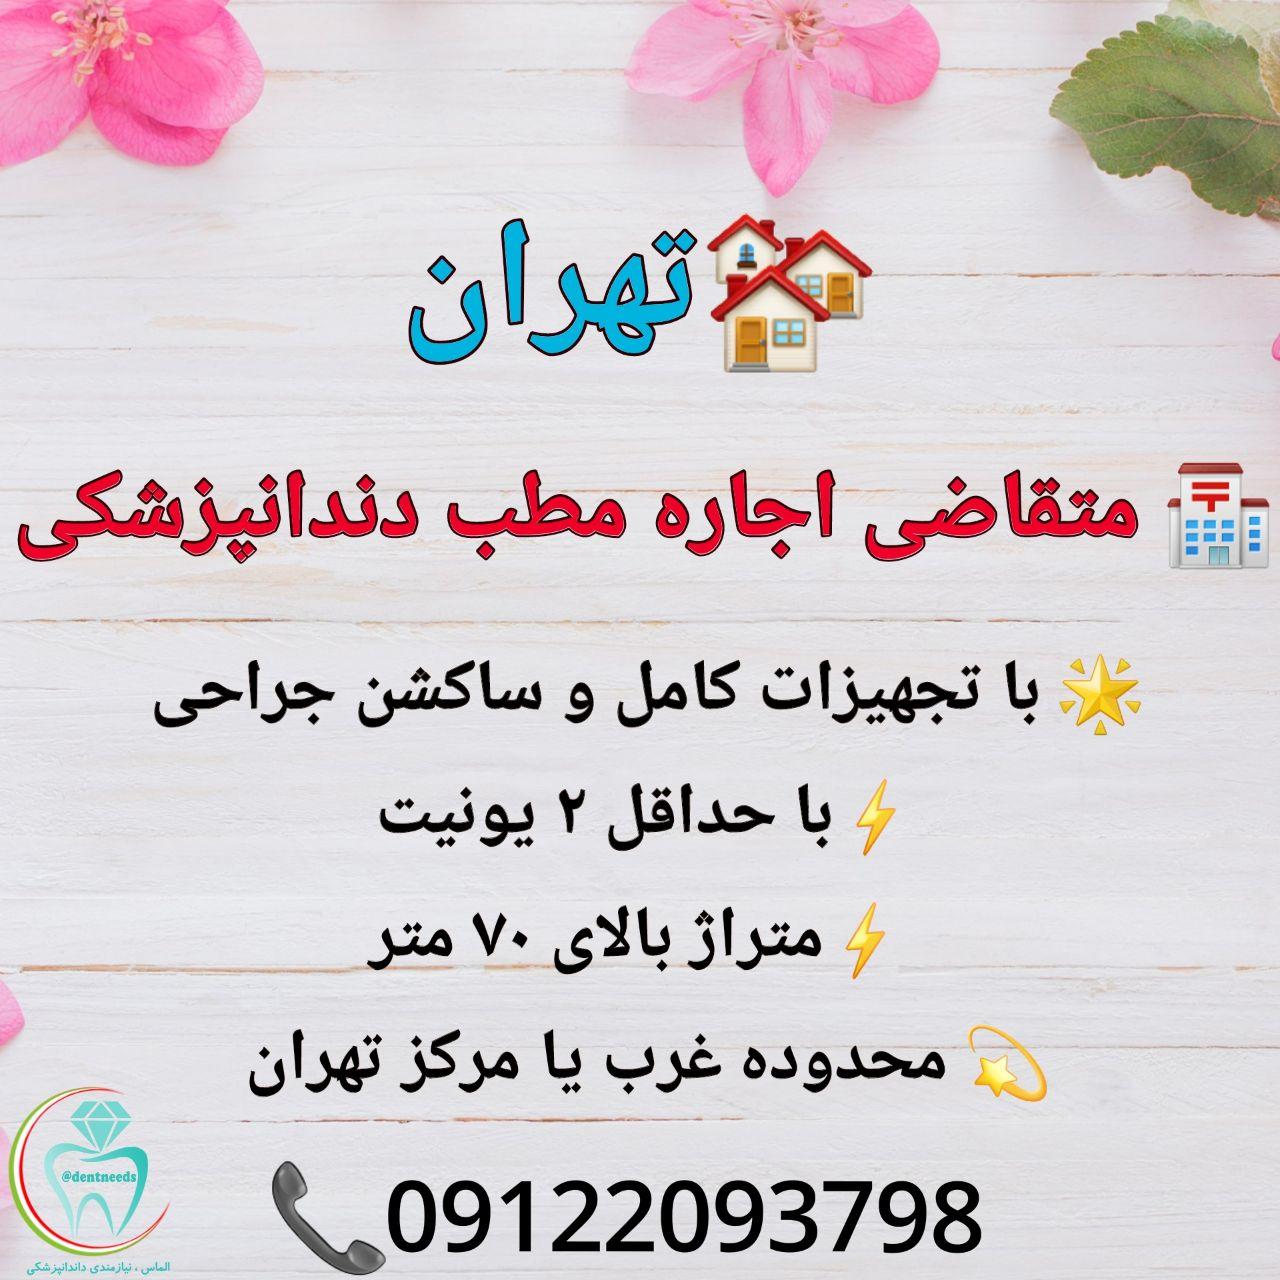 تهران: متقاضی اجاره مطب دندانپزشکی